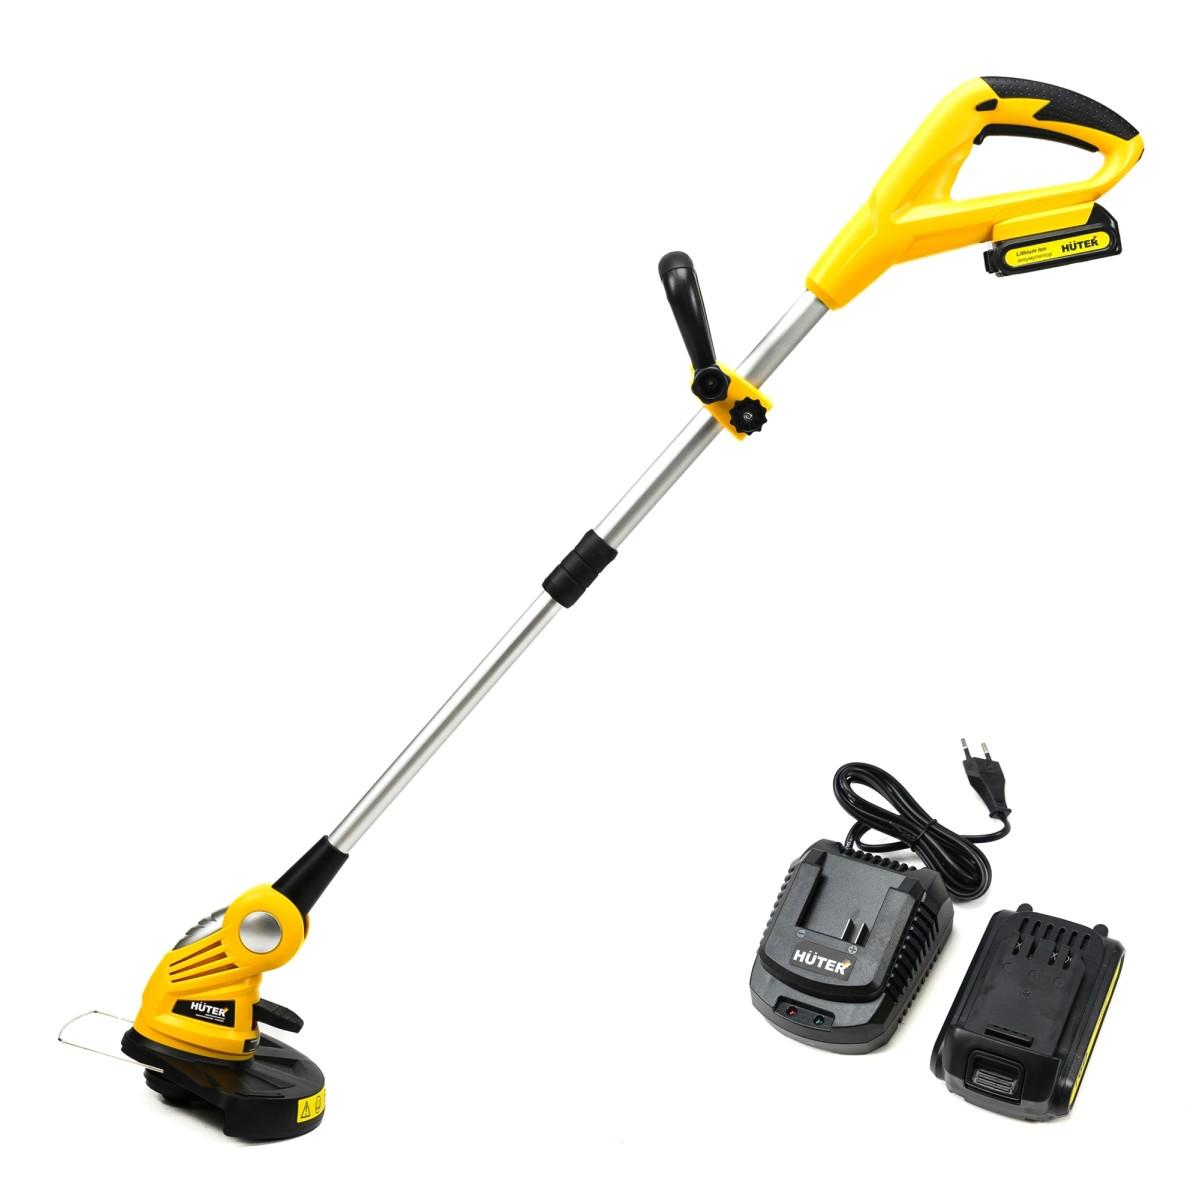 триммер аккумуляторный Huter Get 18 2ли купить